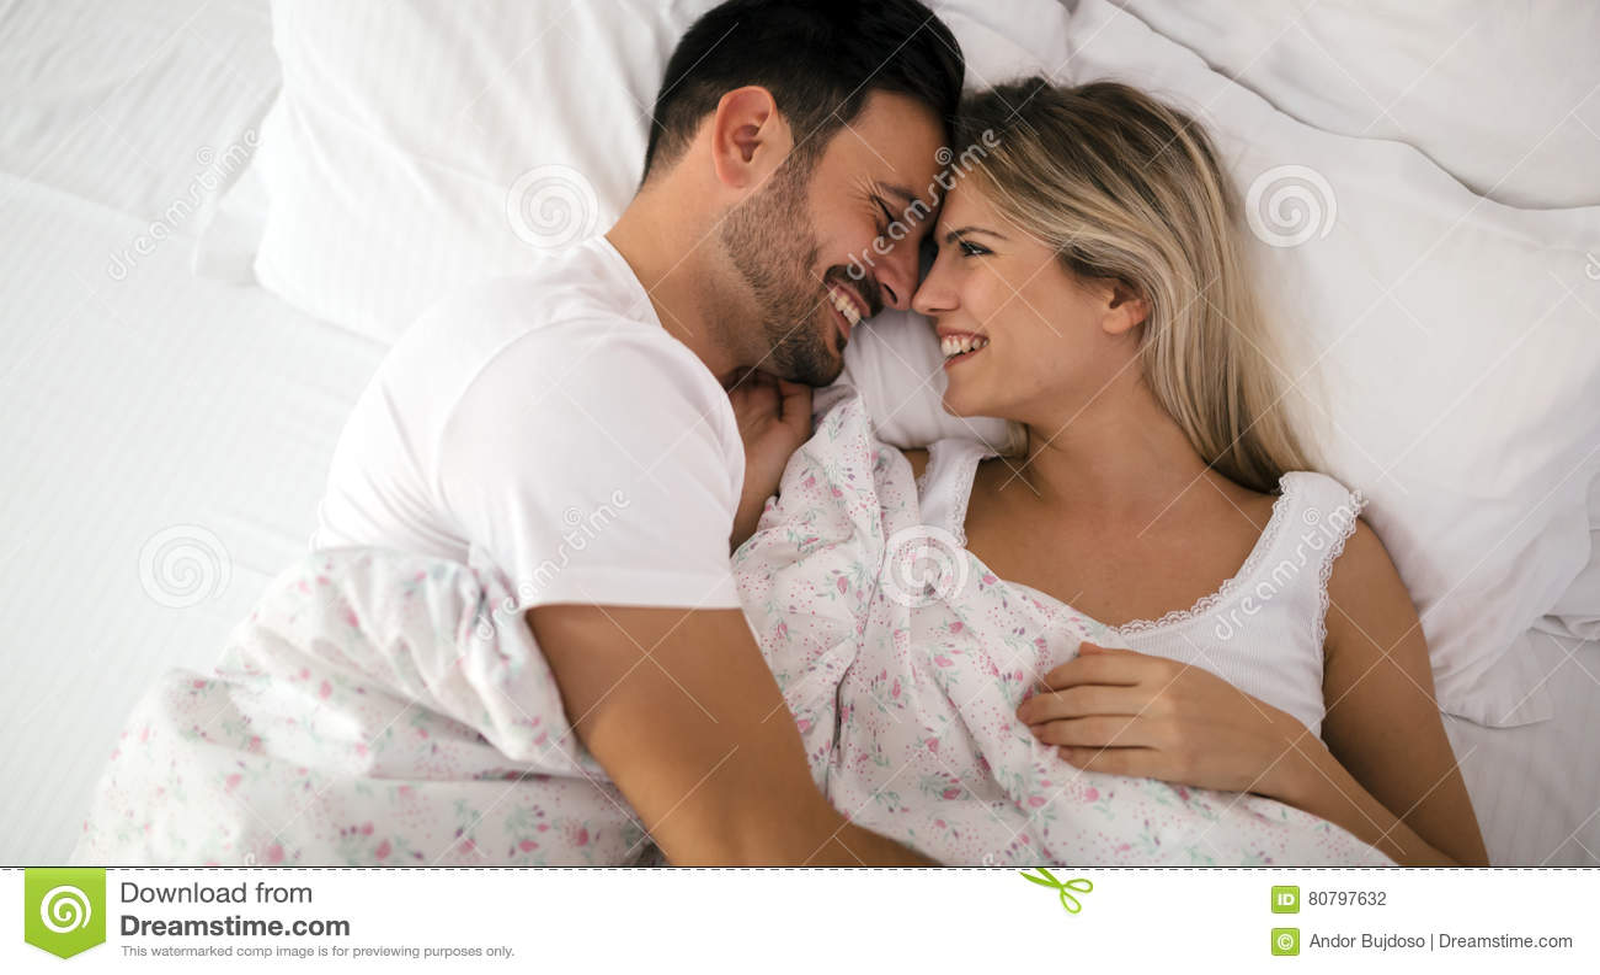 Romantic couple in bed in nightwear. Romantic Couple In Bed In Nightwear Stock Photo   Image  80797632